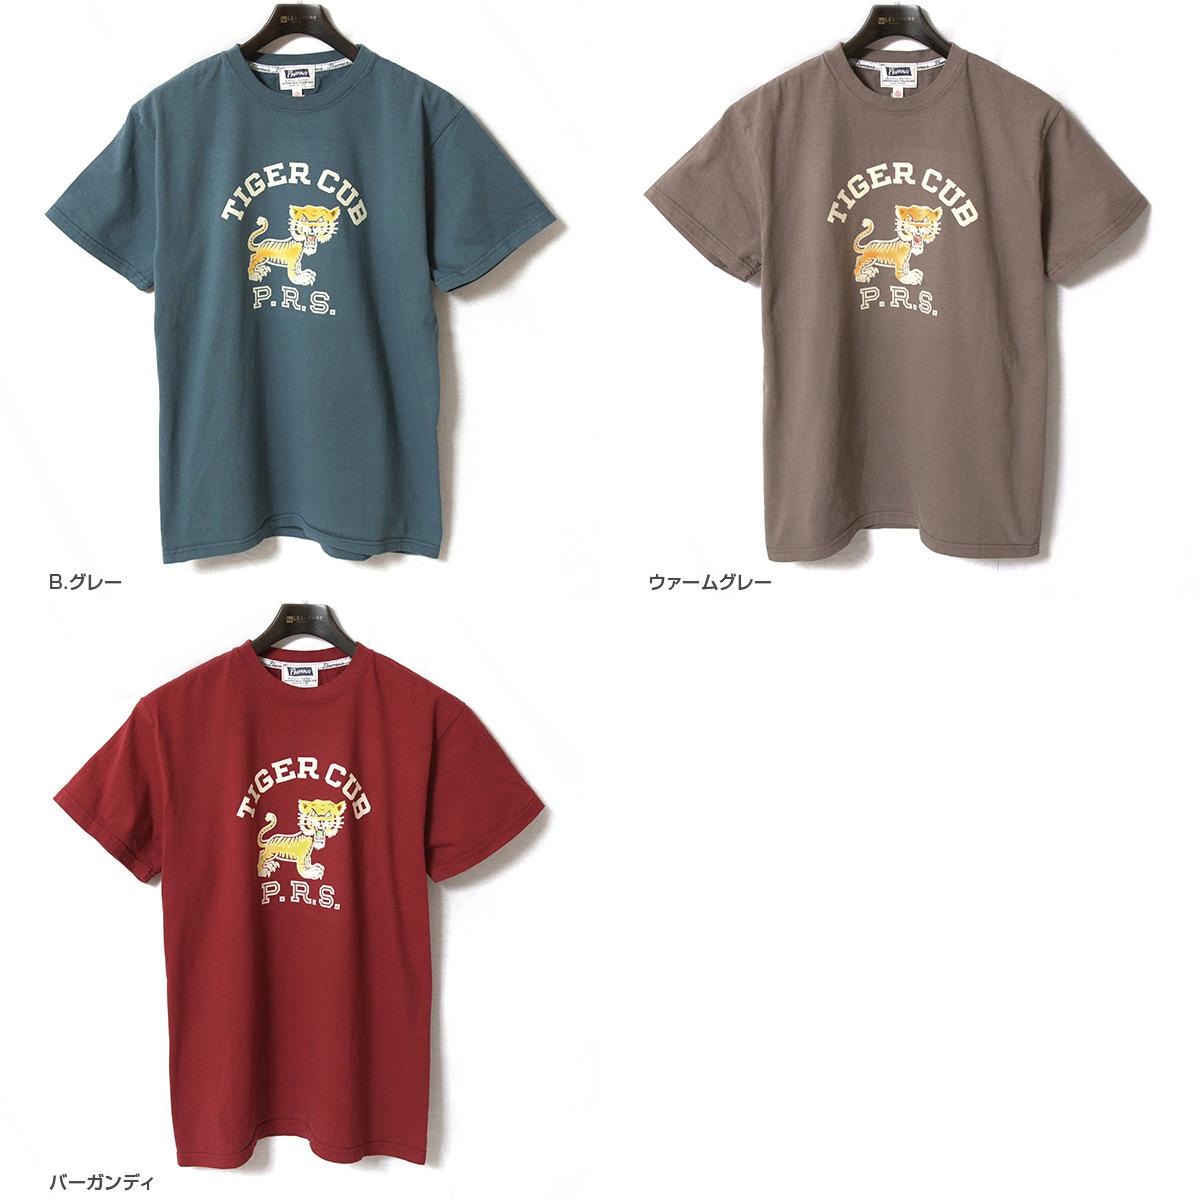 Pherrow's フェローズ 半袖 プリント Tシャツ [TIGER CUB] 19S-PT5